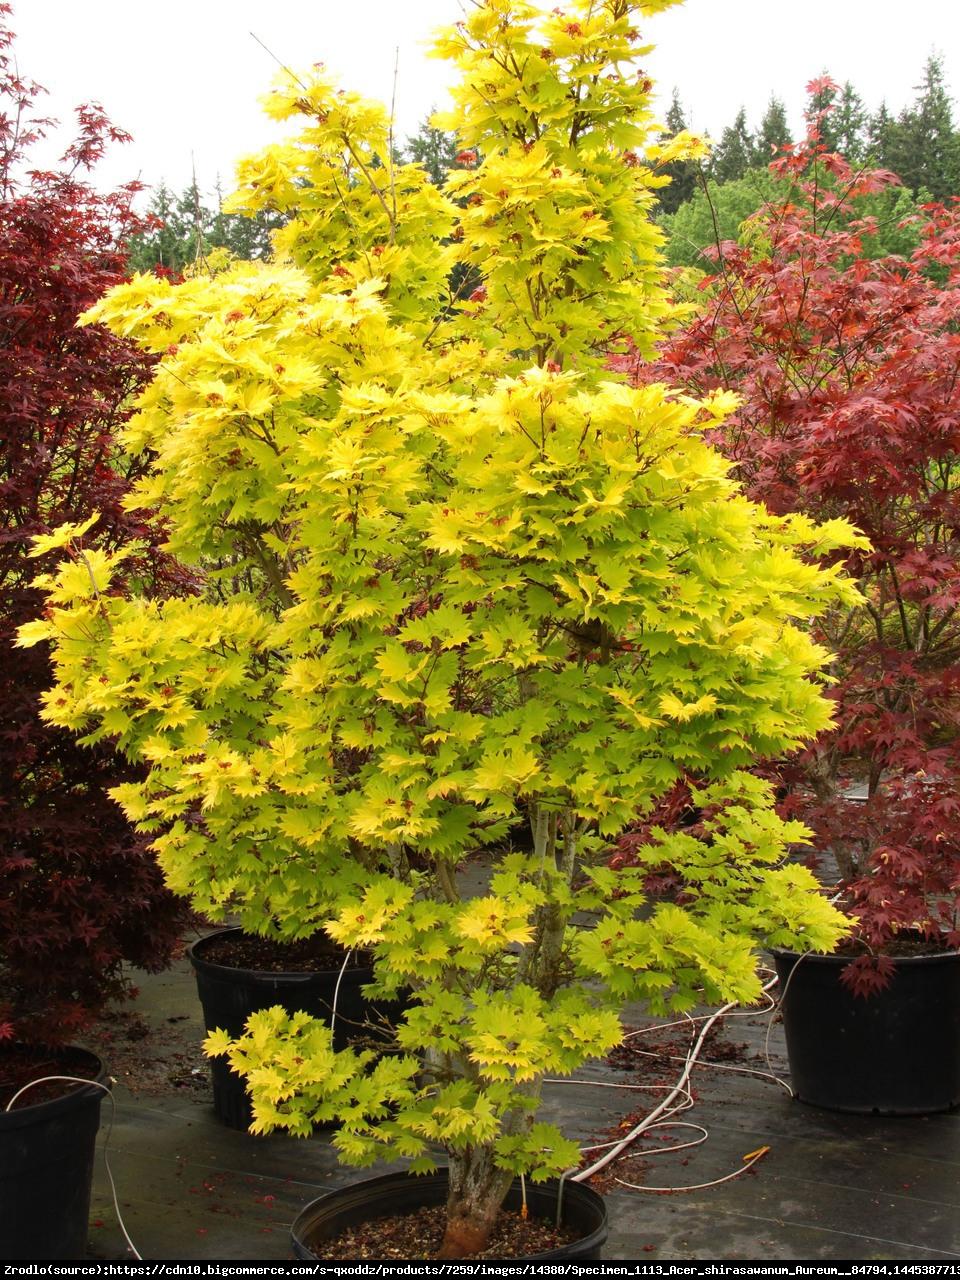 Klon japoński - Shirasawy Aureum - Acer palmatum shirasawanum Aureum